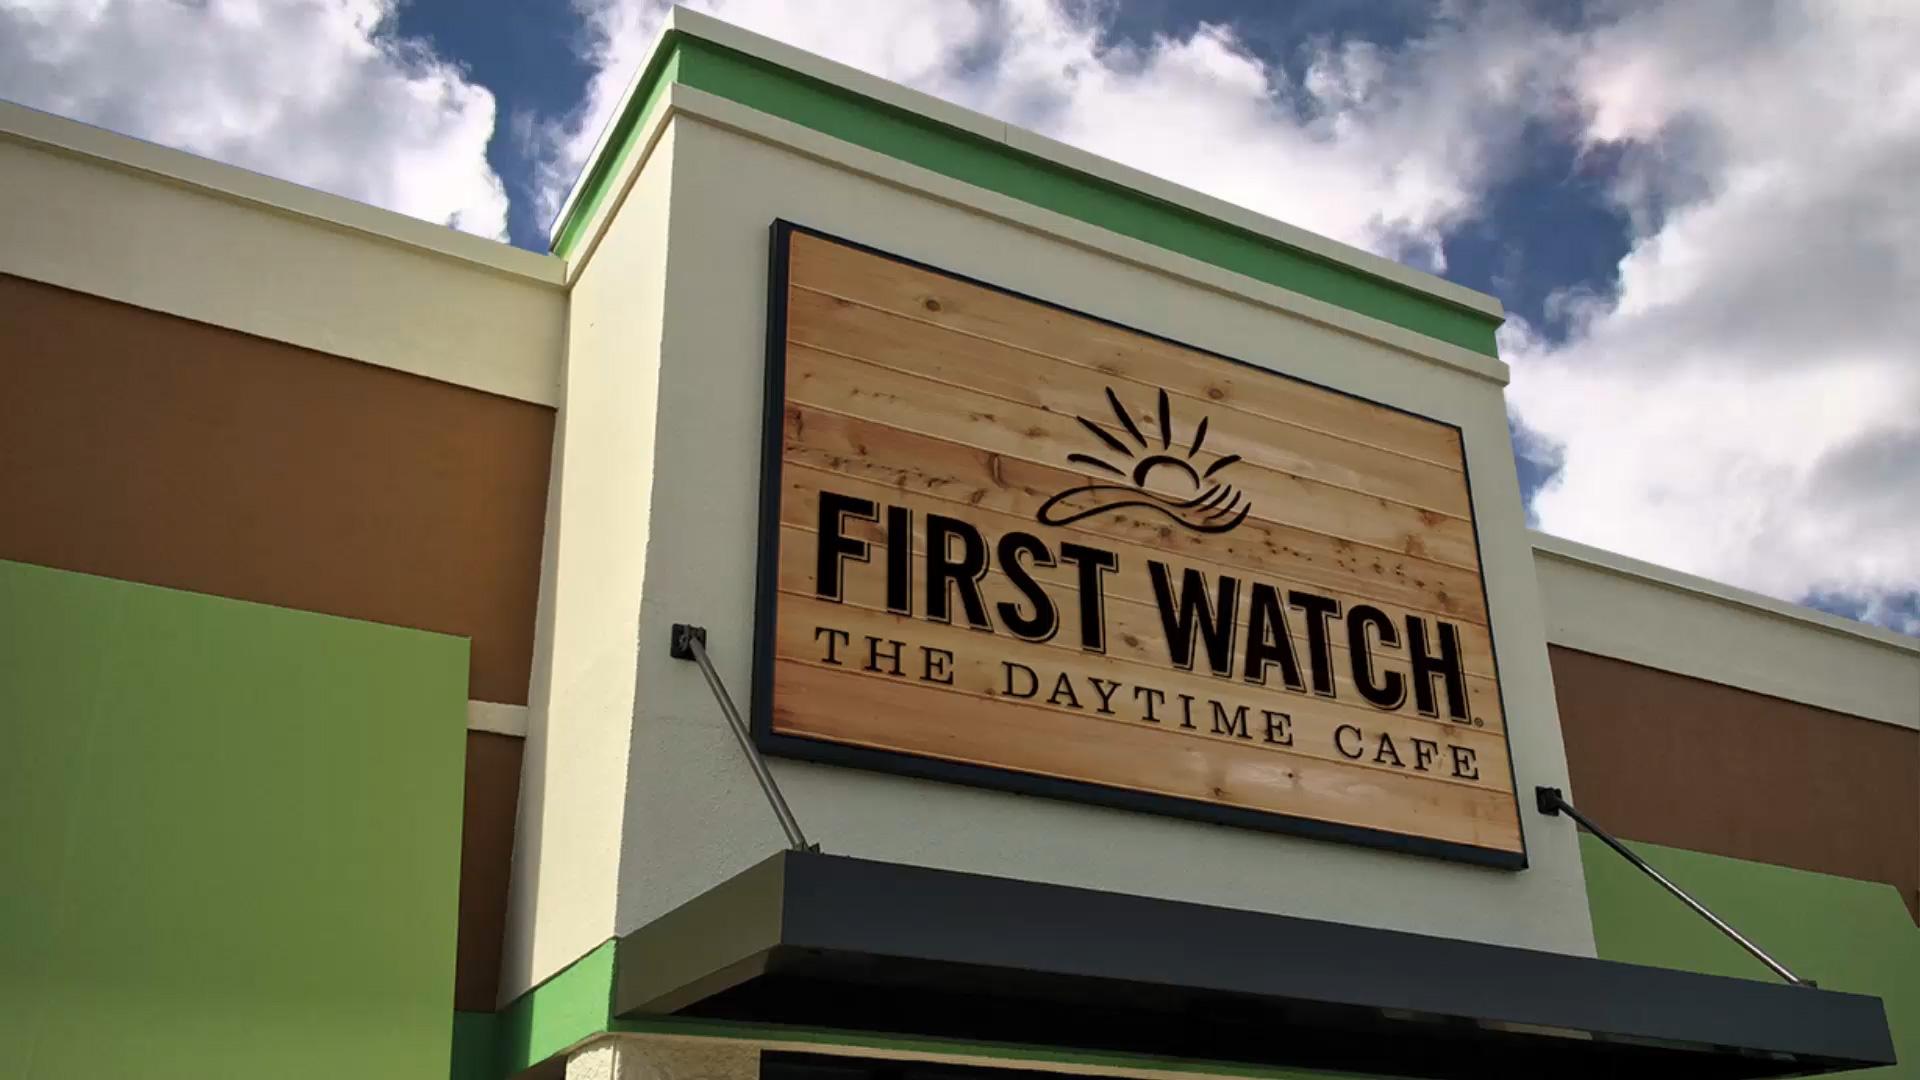 First Watch –  The Daytime Cafe Santa Rosa Beach, Florida